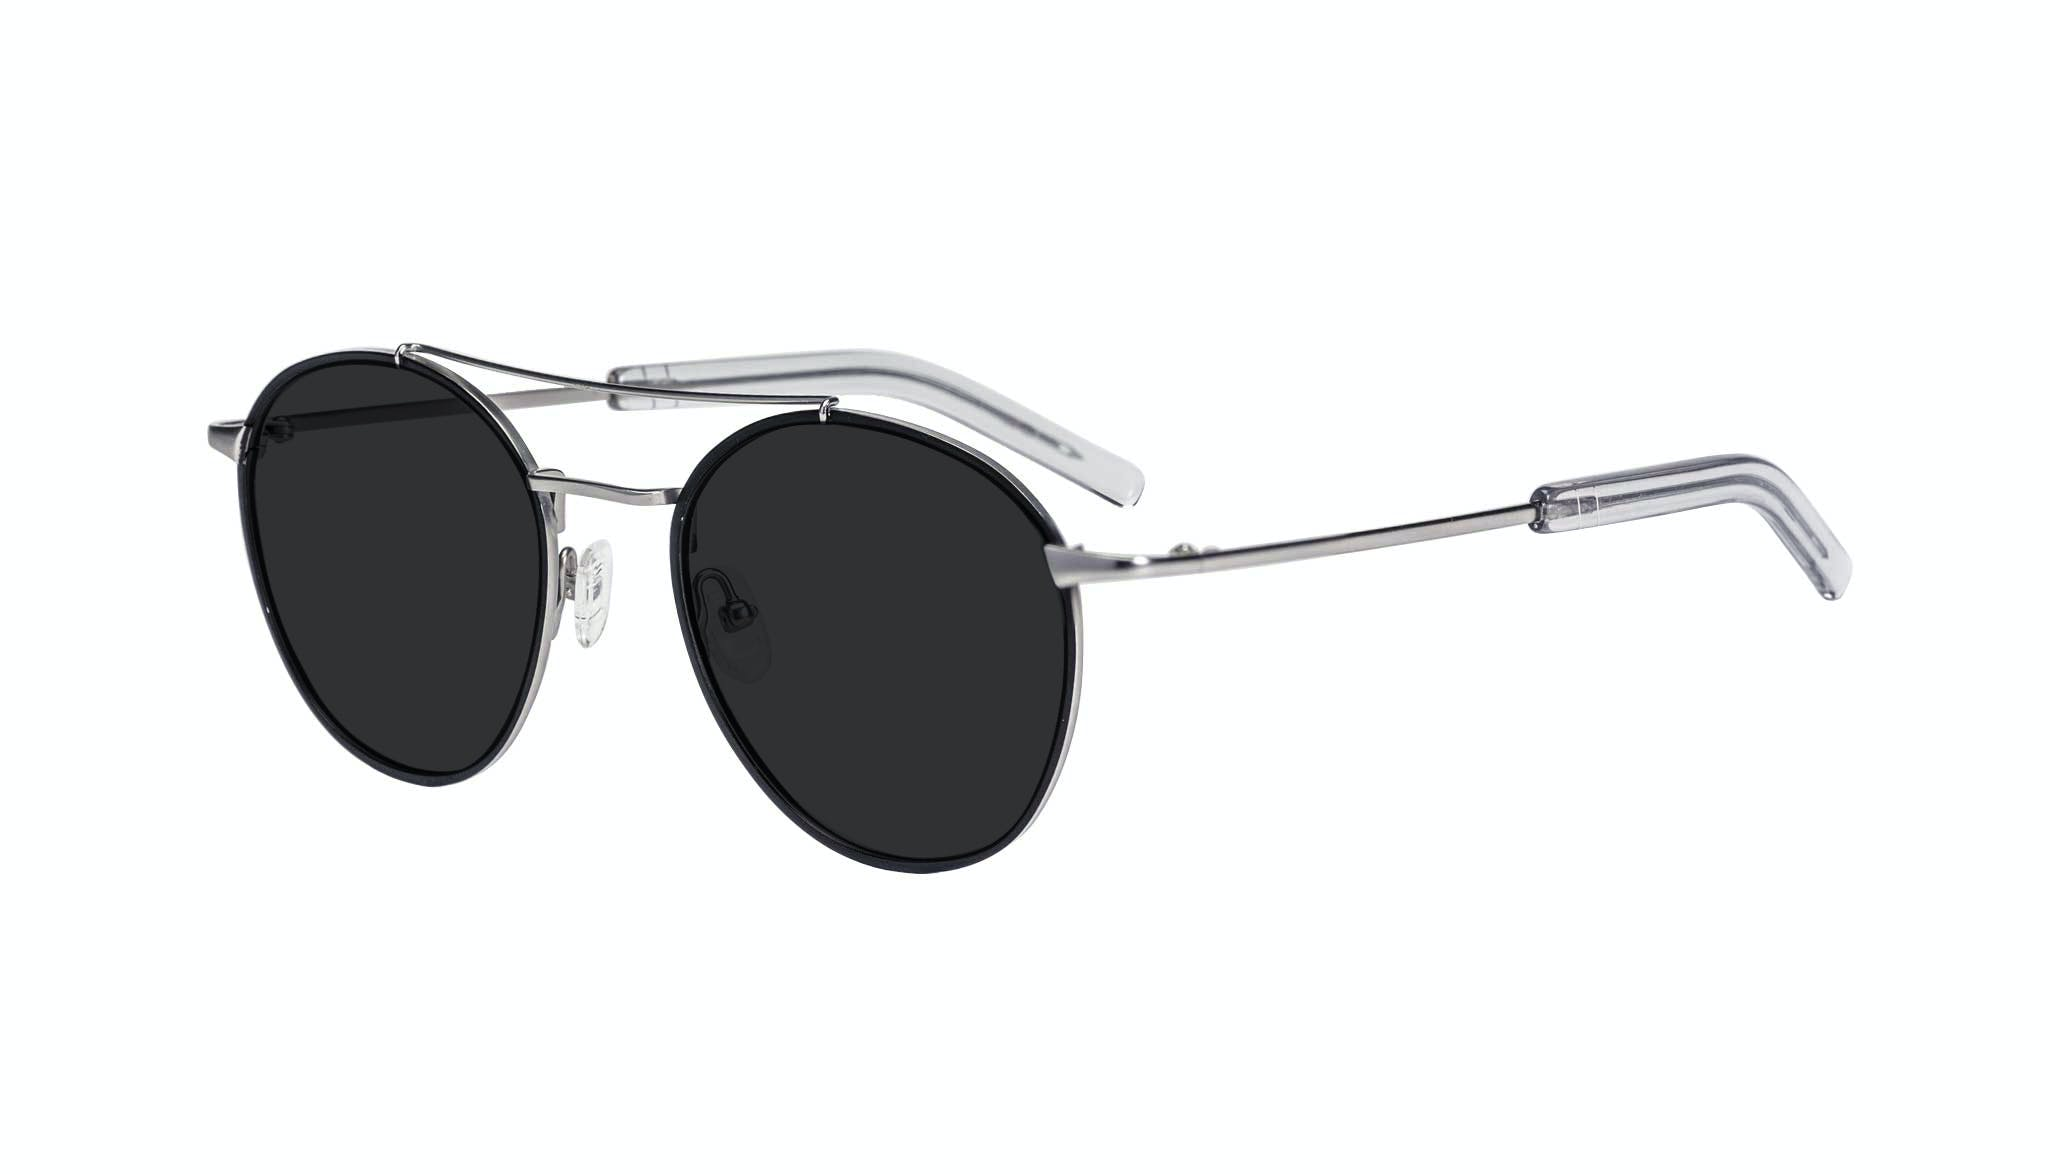 Affordable Fashion Glasses Aviator Sunglasses Men Gravity Black Silver Tilt